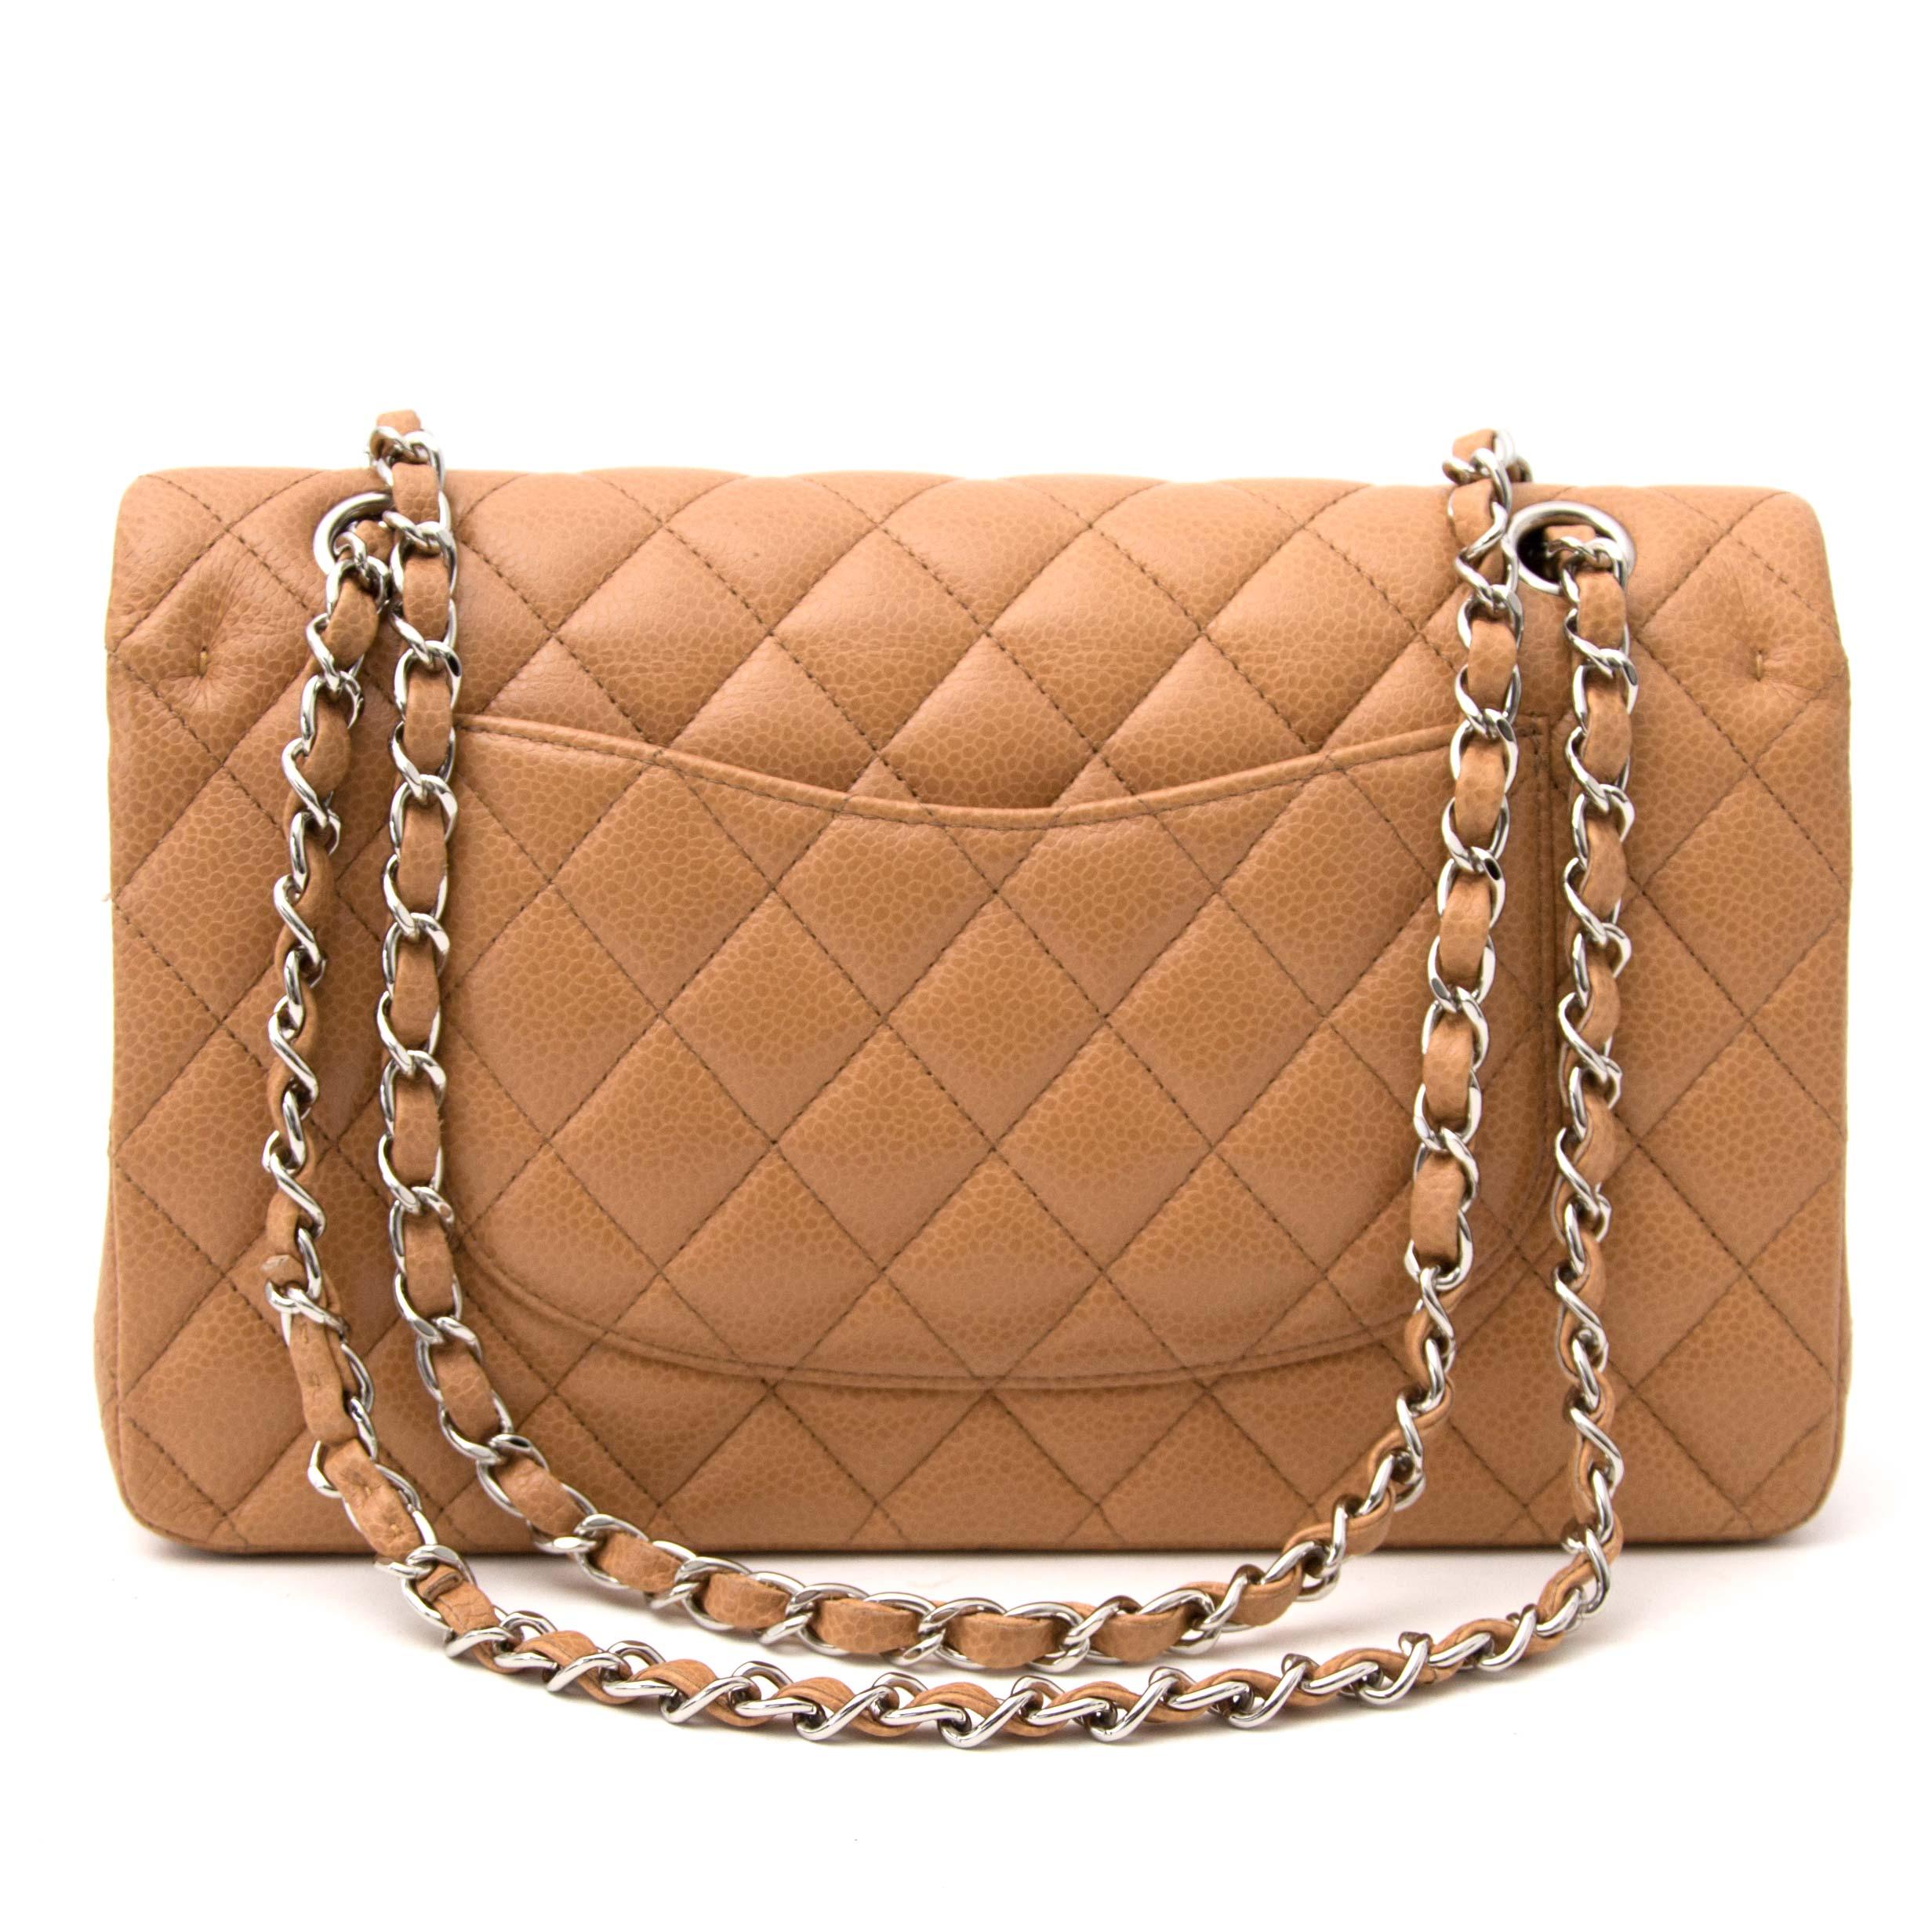 Chanel Beige Caviar Medium Classic Double Flap Bag  te koop